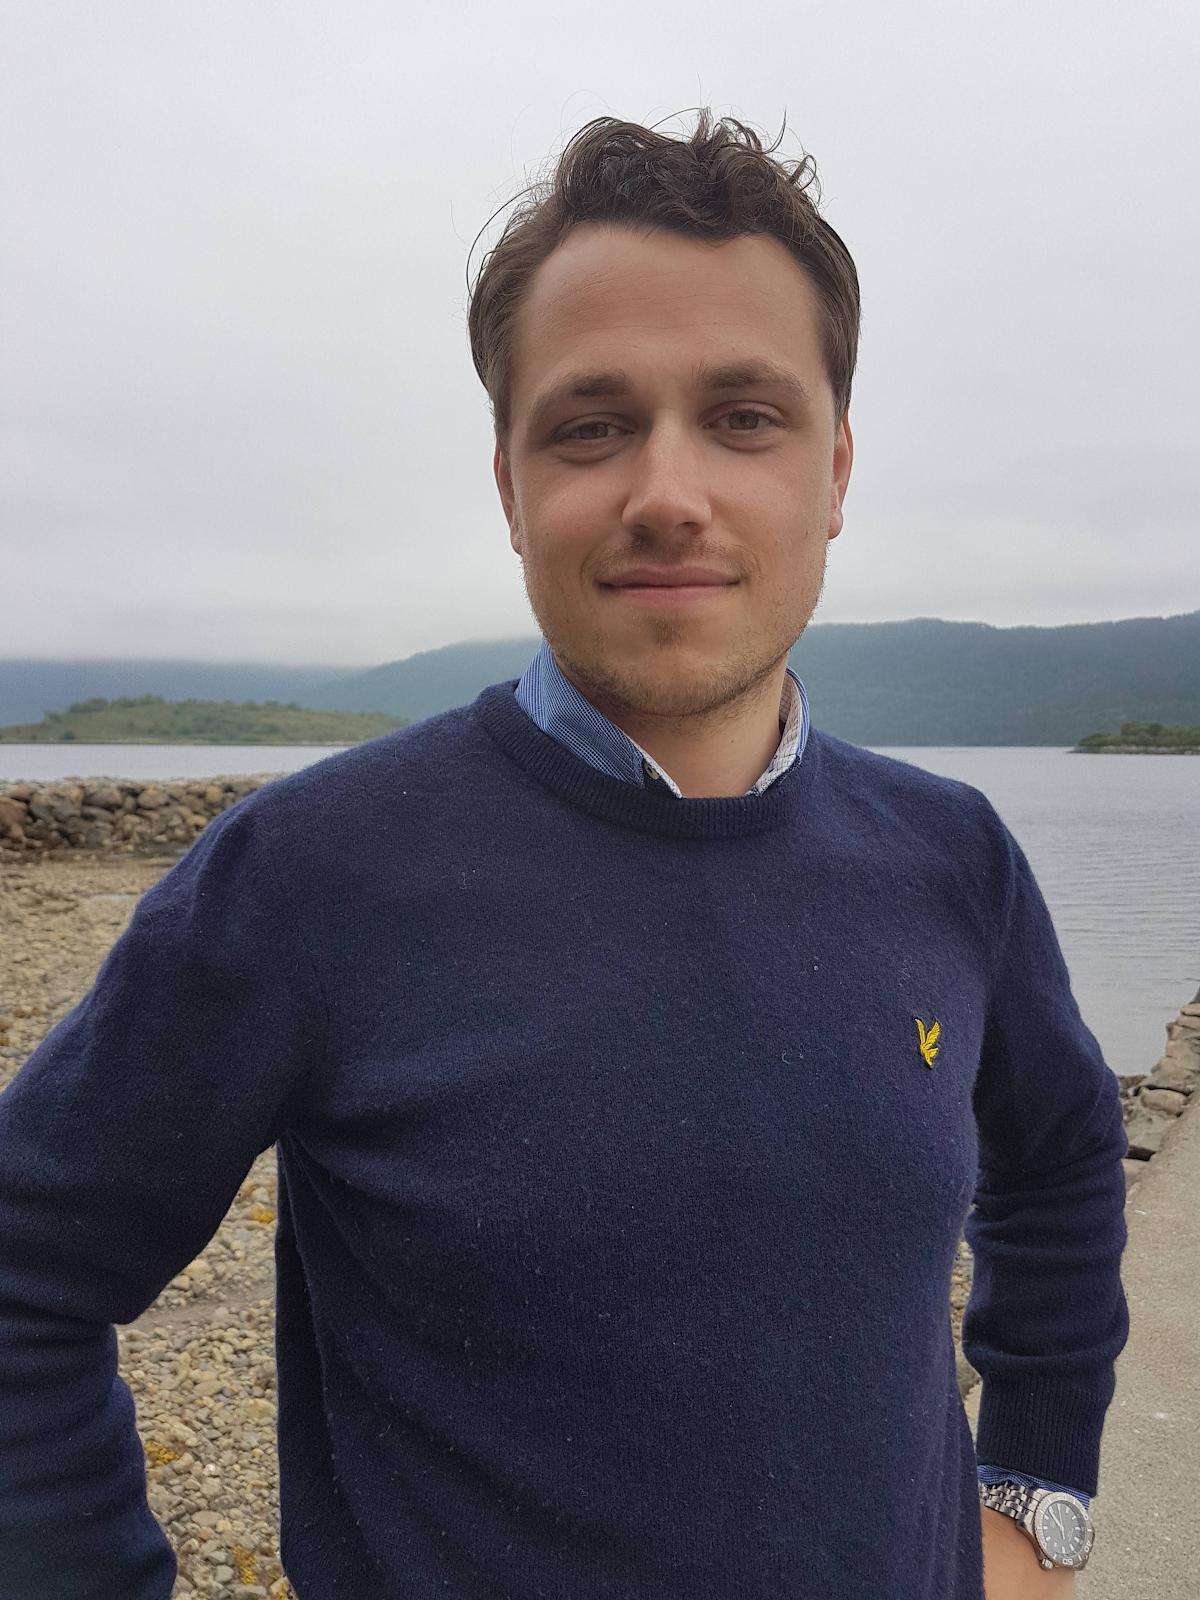 Our business development associate: Lars Thoresen Haug